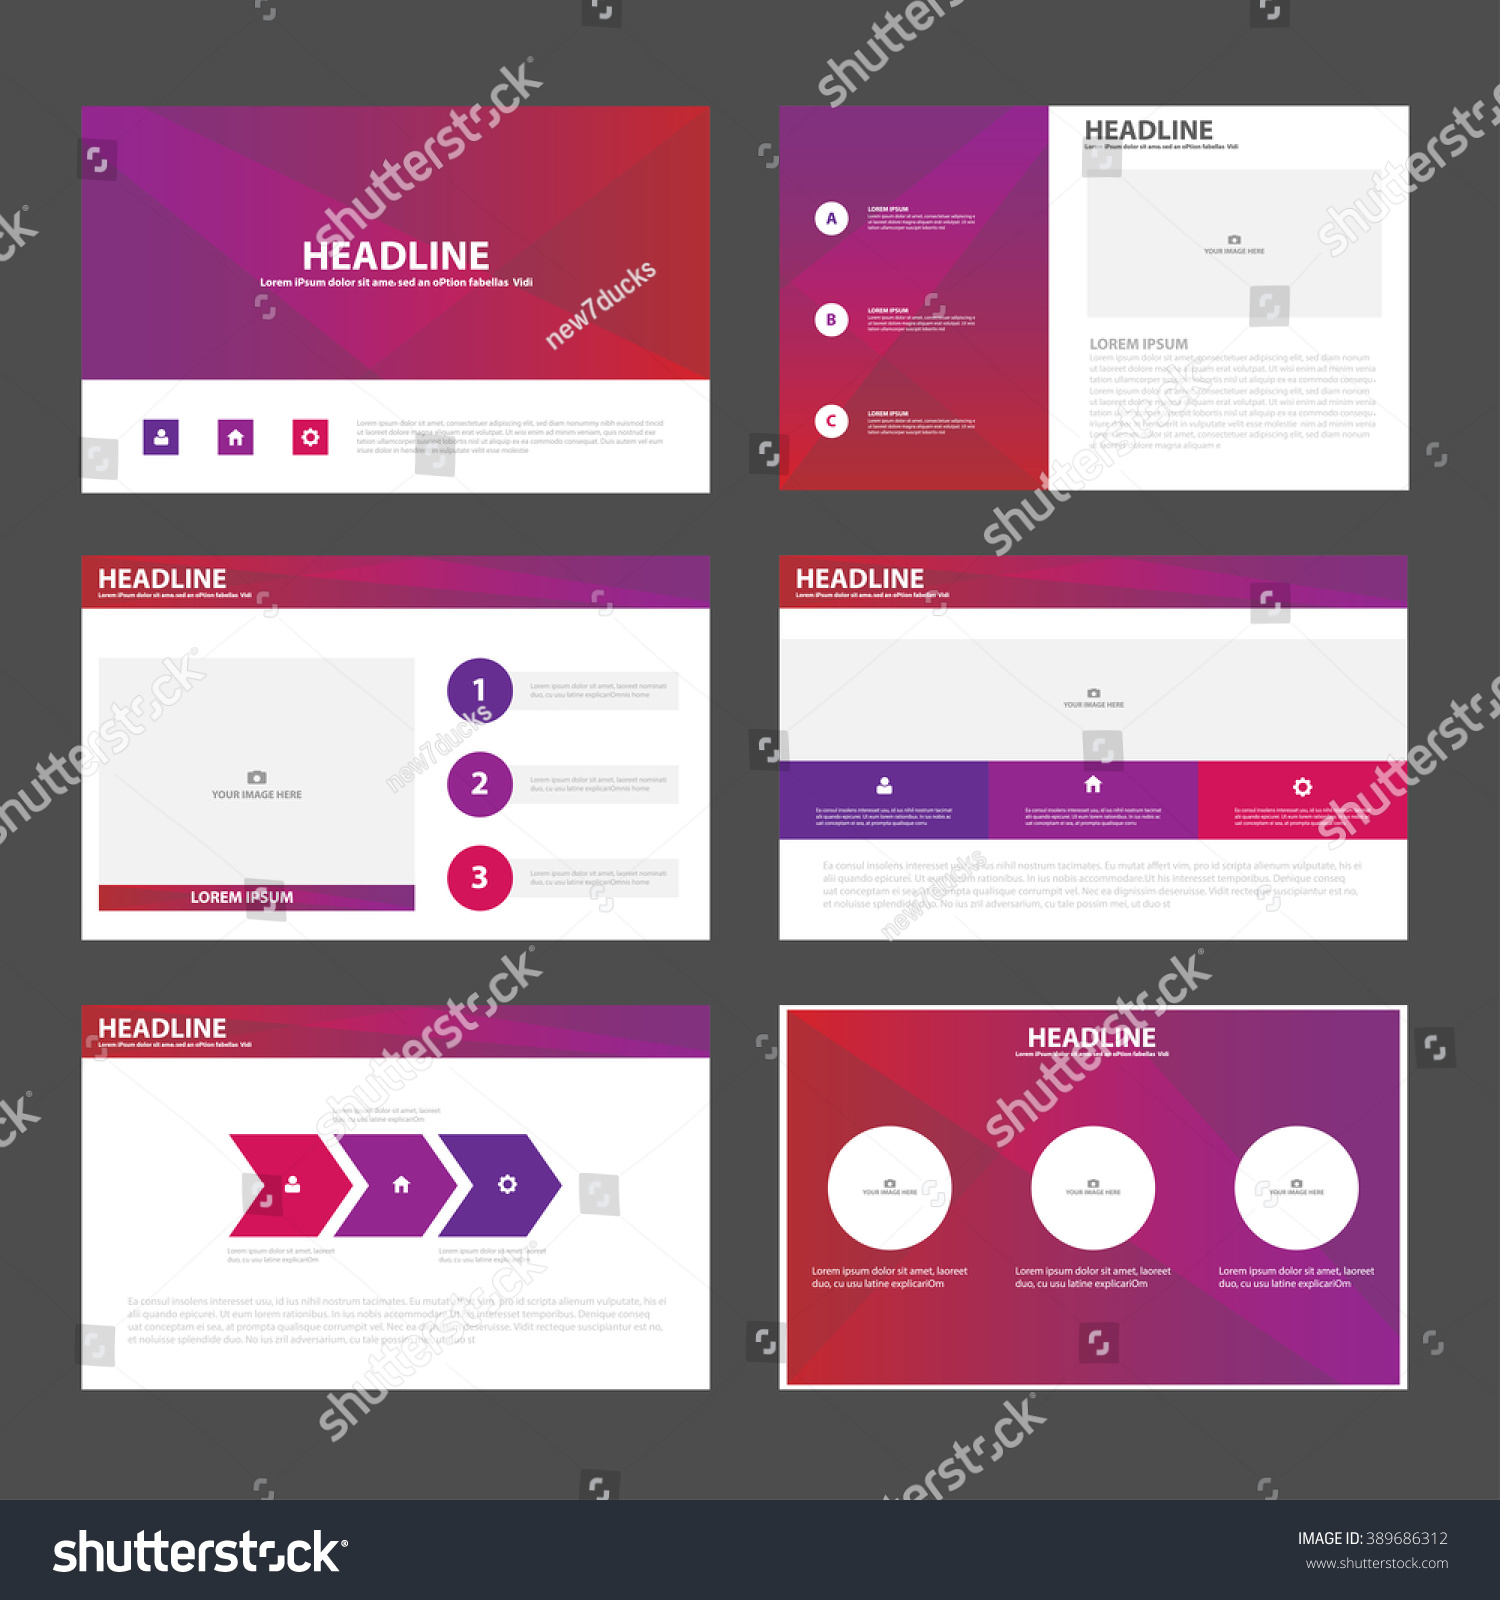 purple pink presentation templates annual report stock vector 389686312 shutterstock. Black Bedroom Furniture Sets. Home Design Ideas